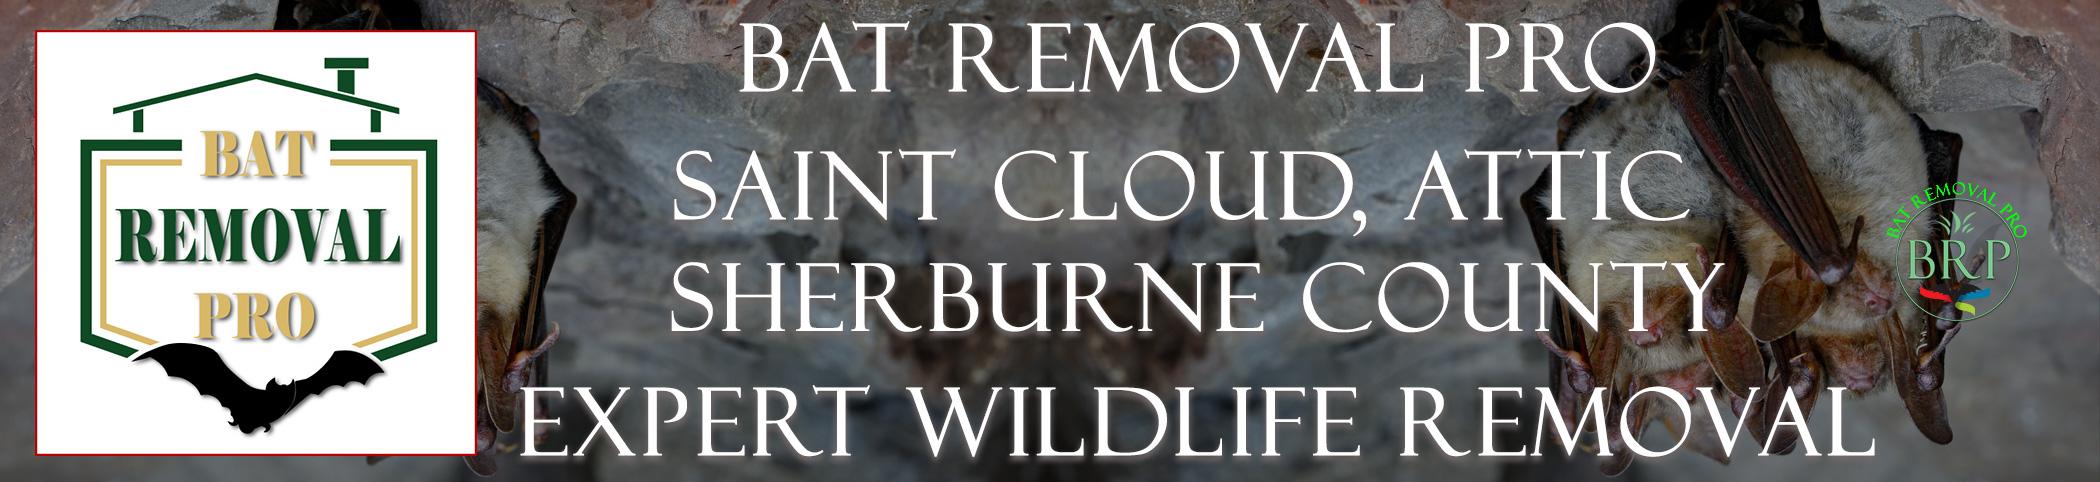 saintcloud_attic_sherburne_county_minnesota header image at bat removal pro